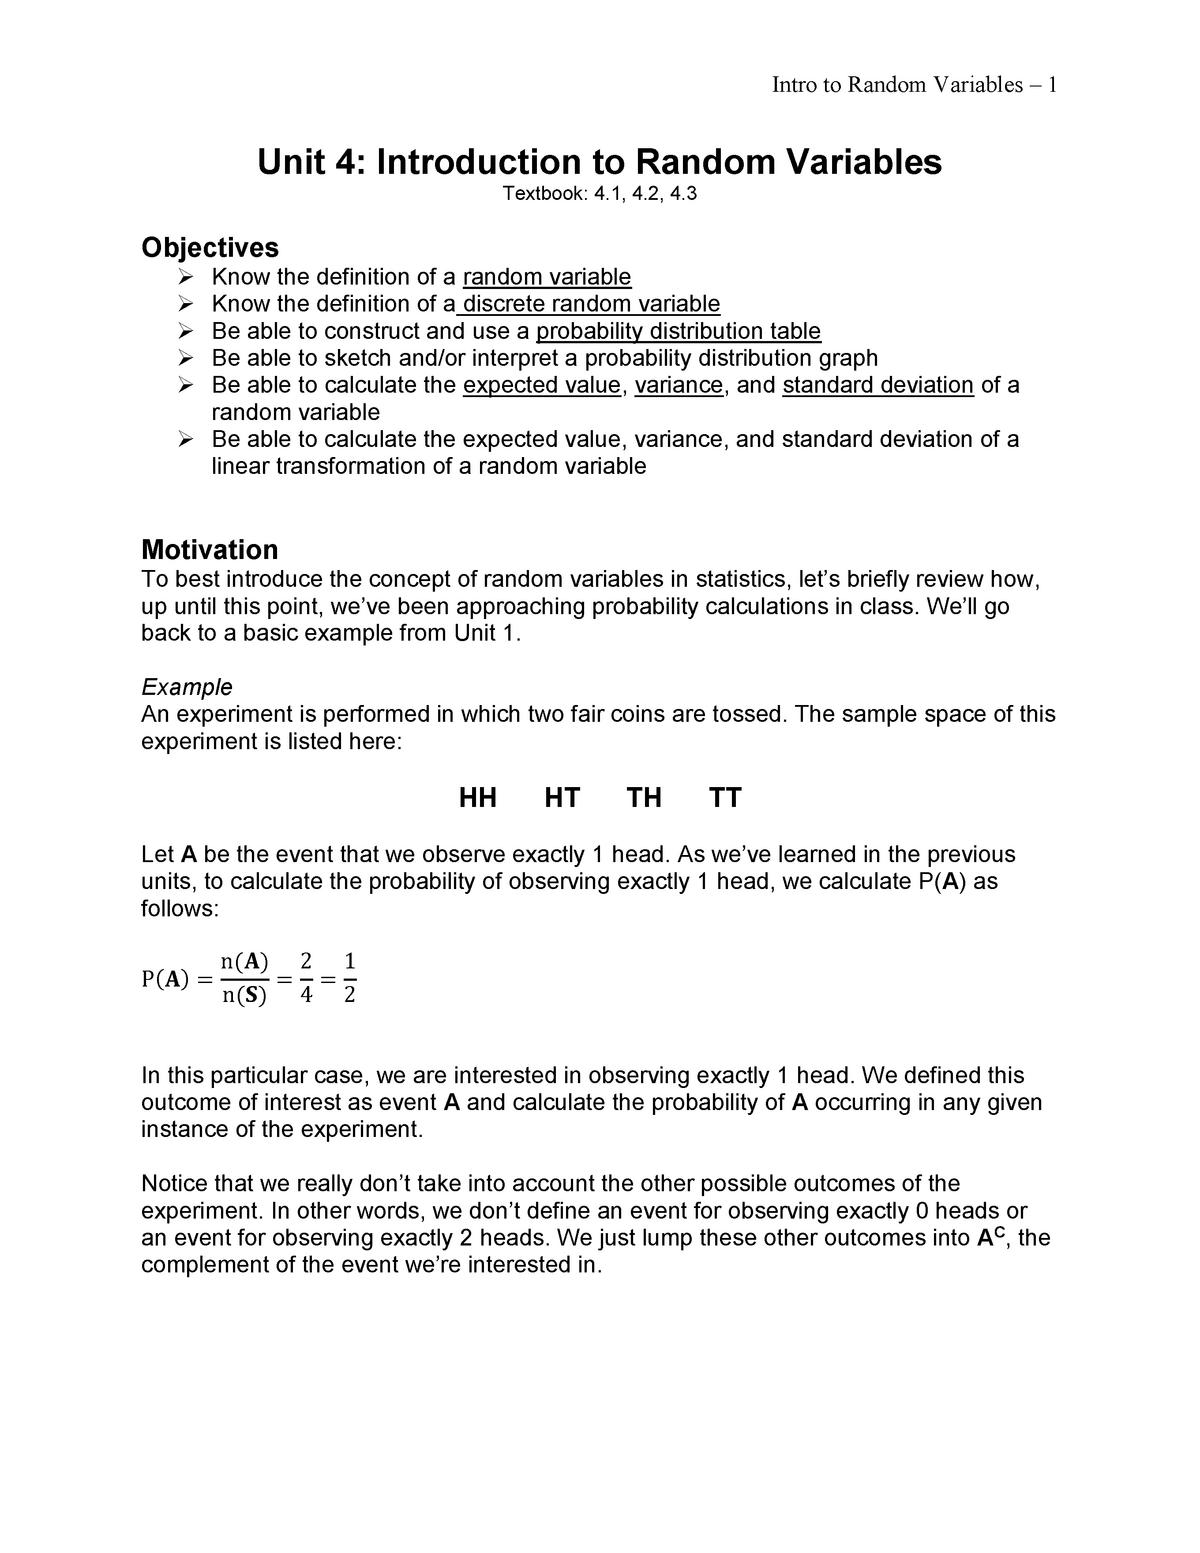 Unit 4 - Introduction to Random Variables - Statistics 213